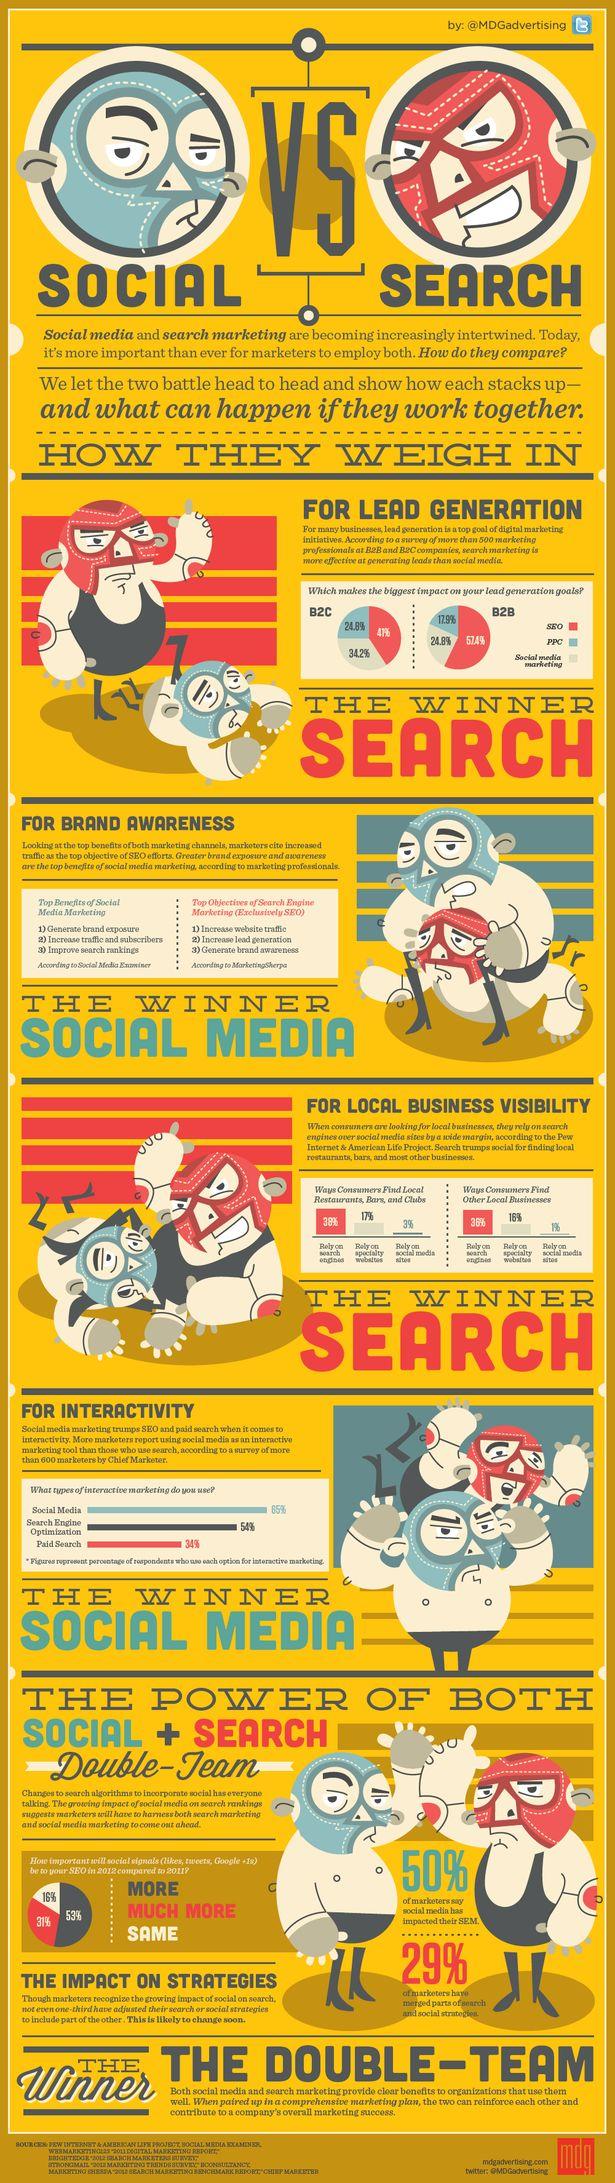 SOCIAL Vs. SEARCH Is Social Media worth it?